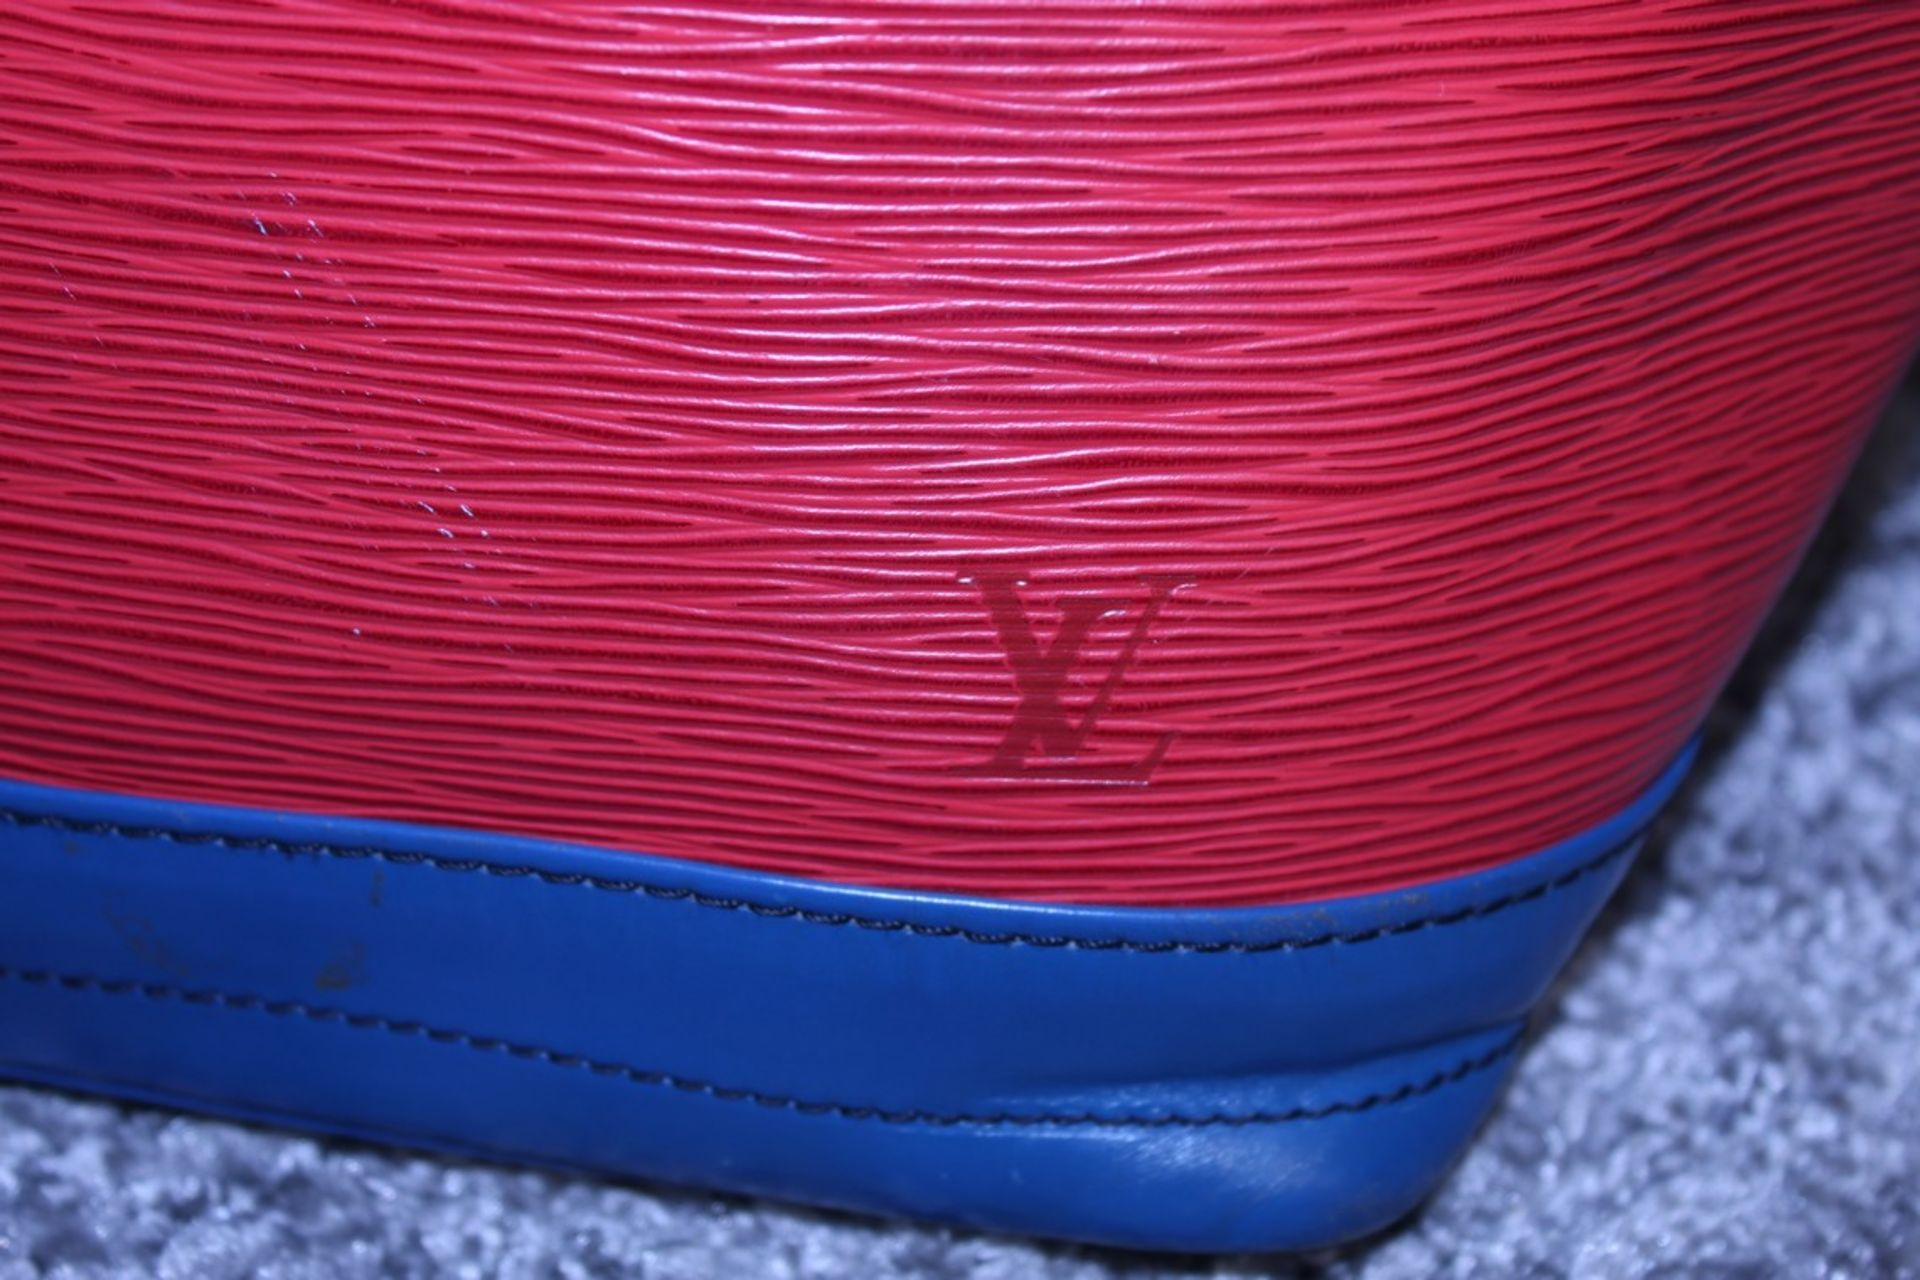 RRP £1,200 Noe Tricolor Shoulder Bag, Red/Blue/Green Epi Claf Leather With Black Stitching - Image 3 of 4